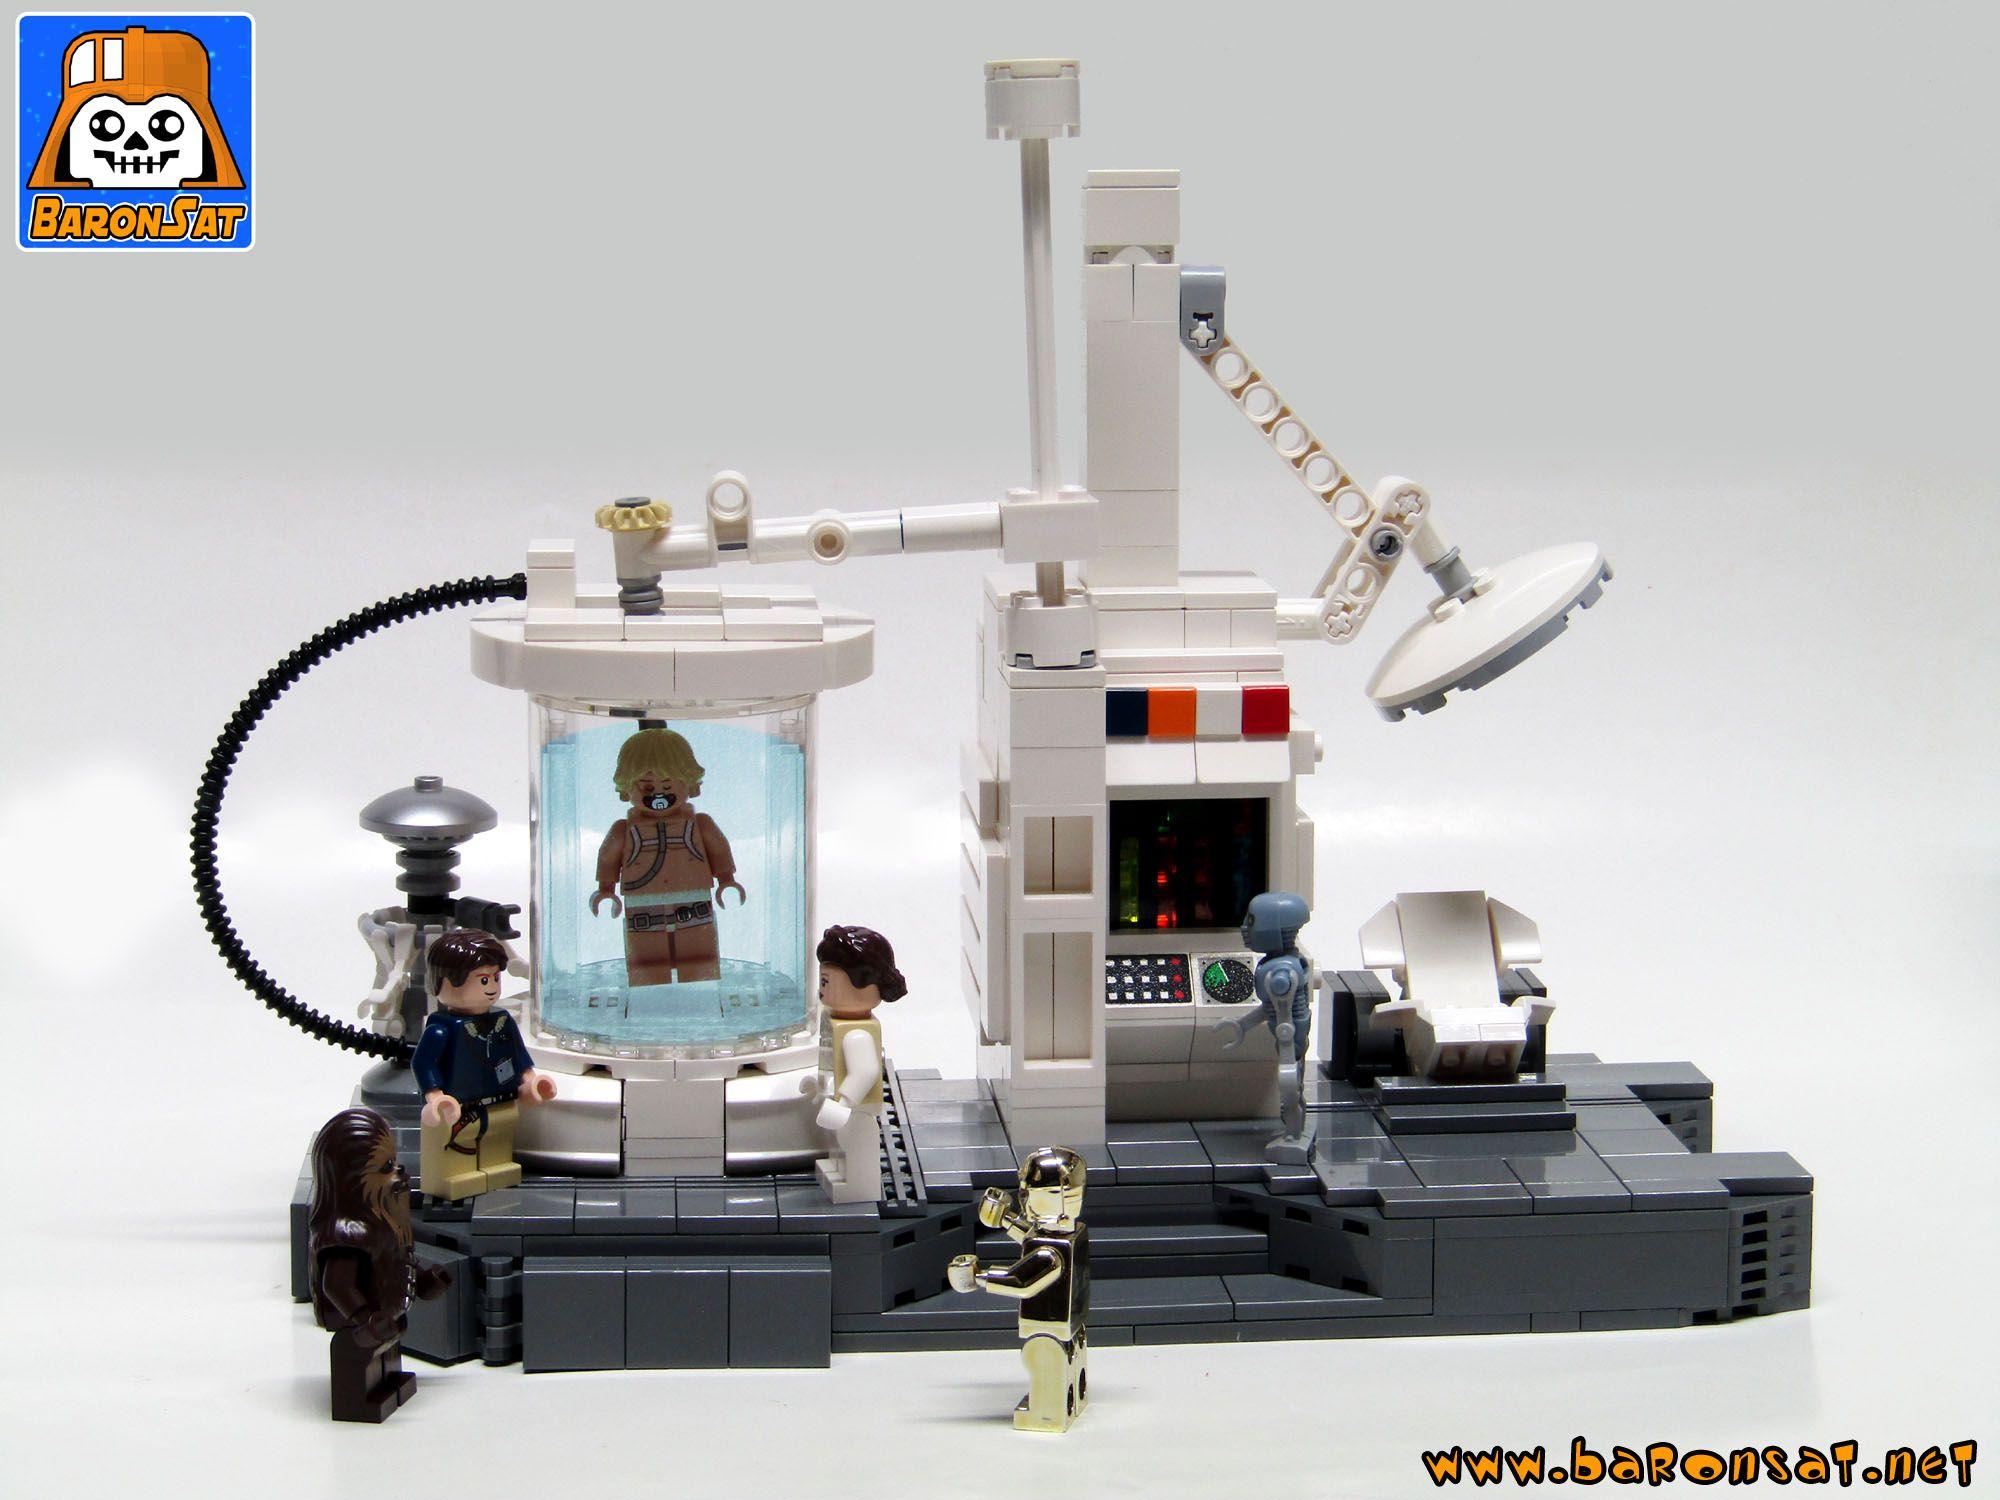 Baronsat Website Lego3 Pinterest Lego Lego Star Wars And Lego